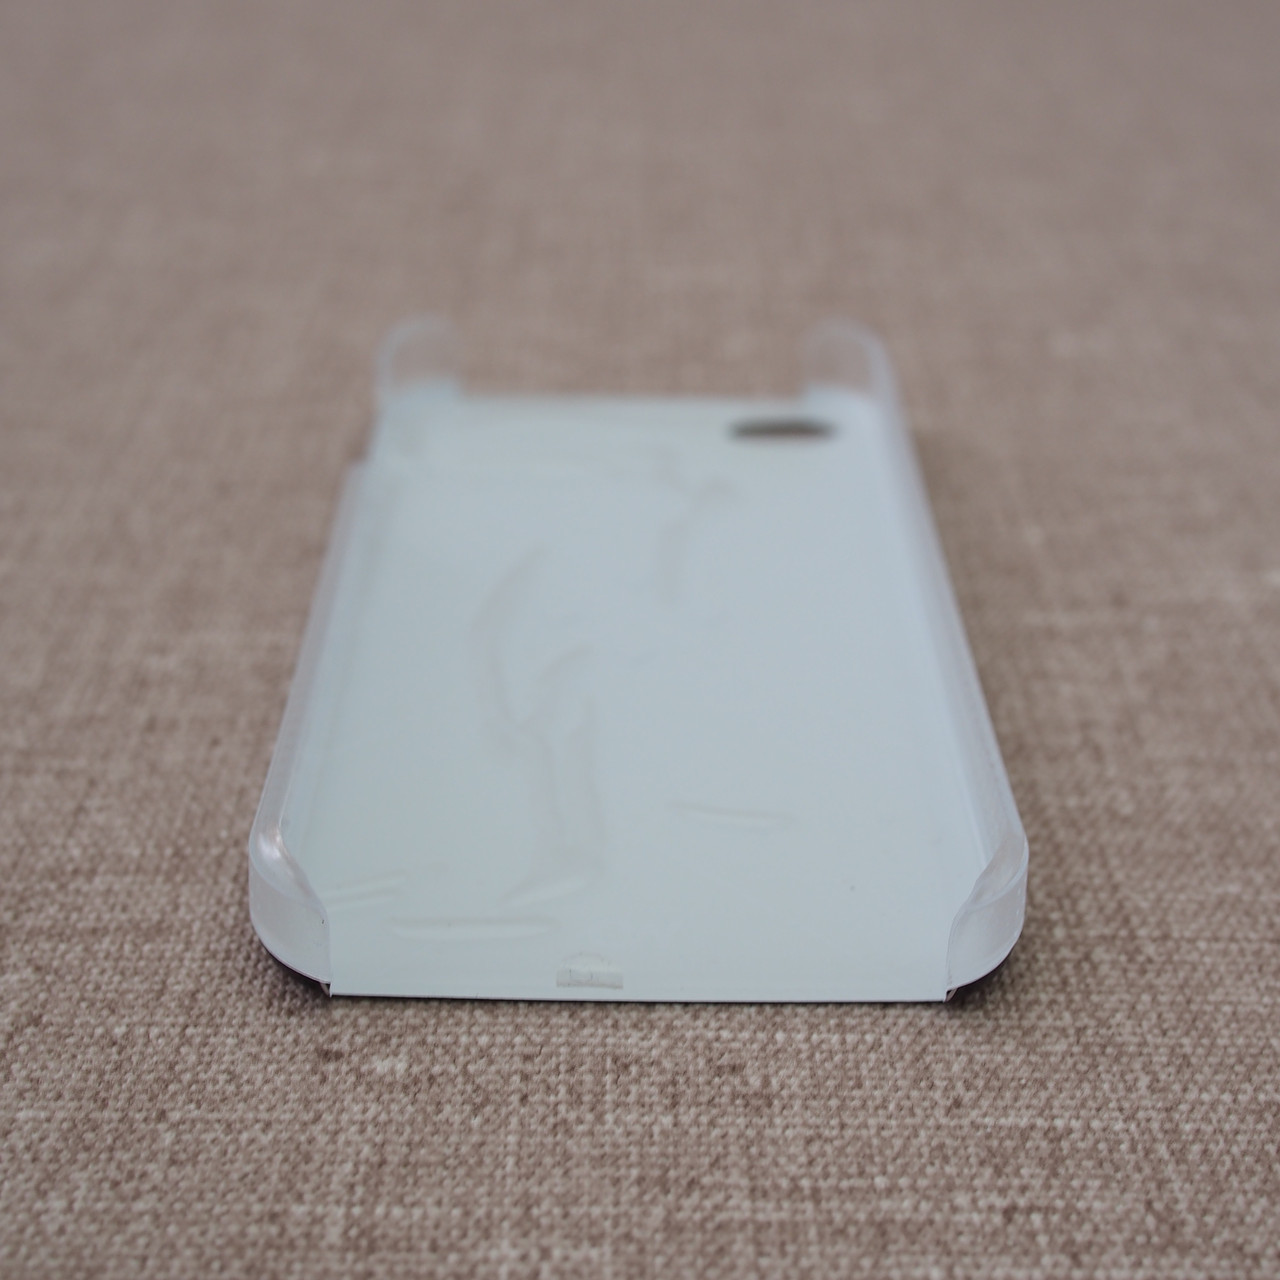 White Diamonds Grid black iPhone 4 4S Apple 4s Для телефона